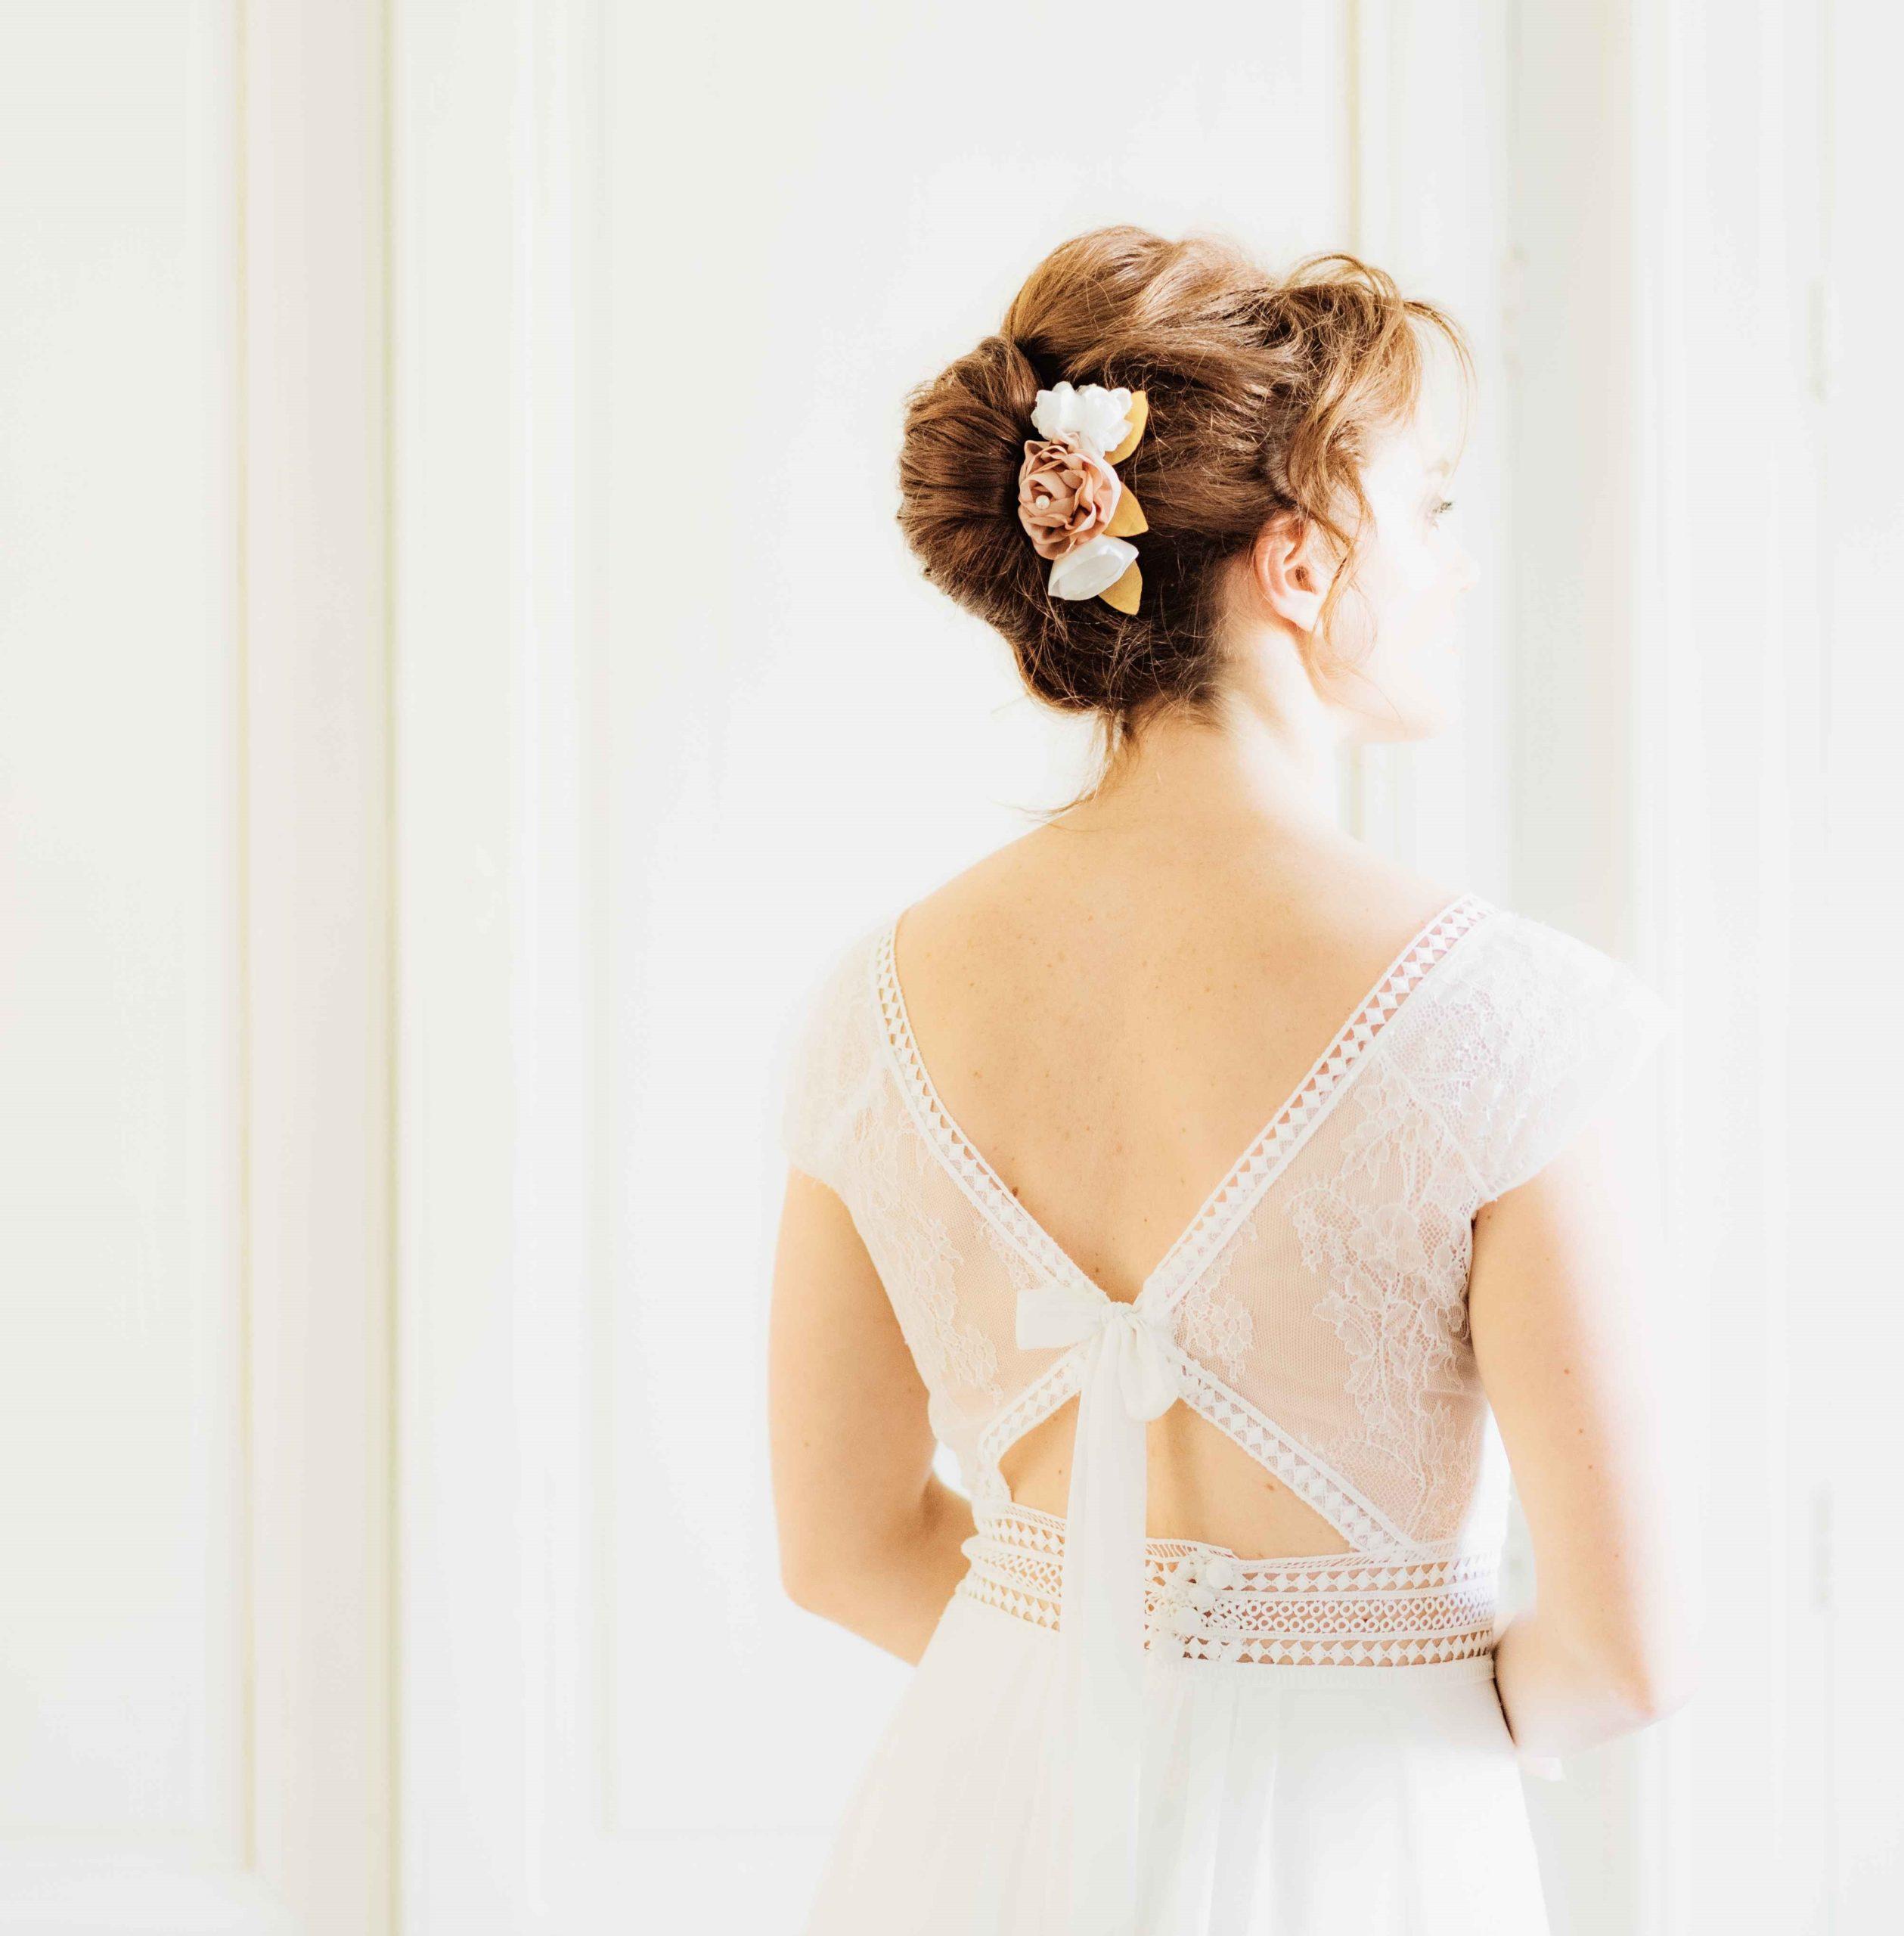 Peigne Apolline 3 Alice Marty - Couture florale Accessoires Mariage